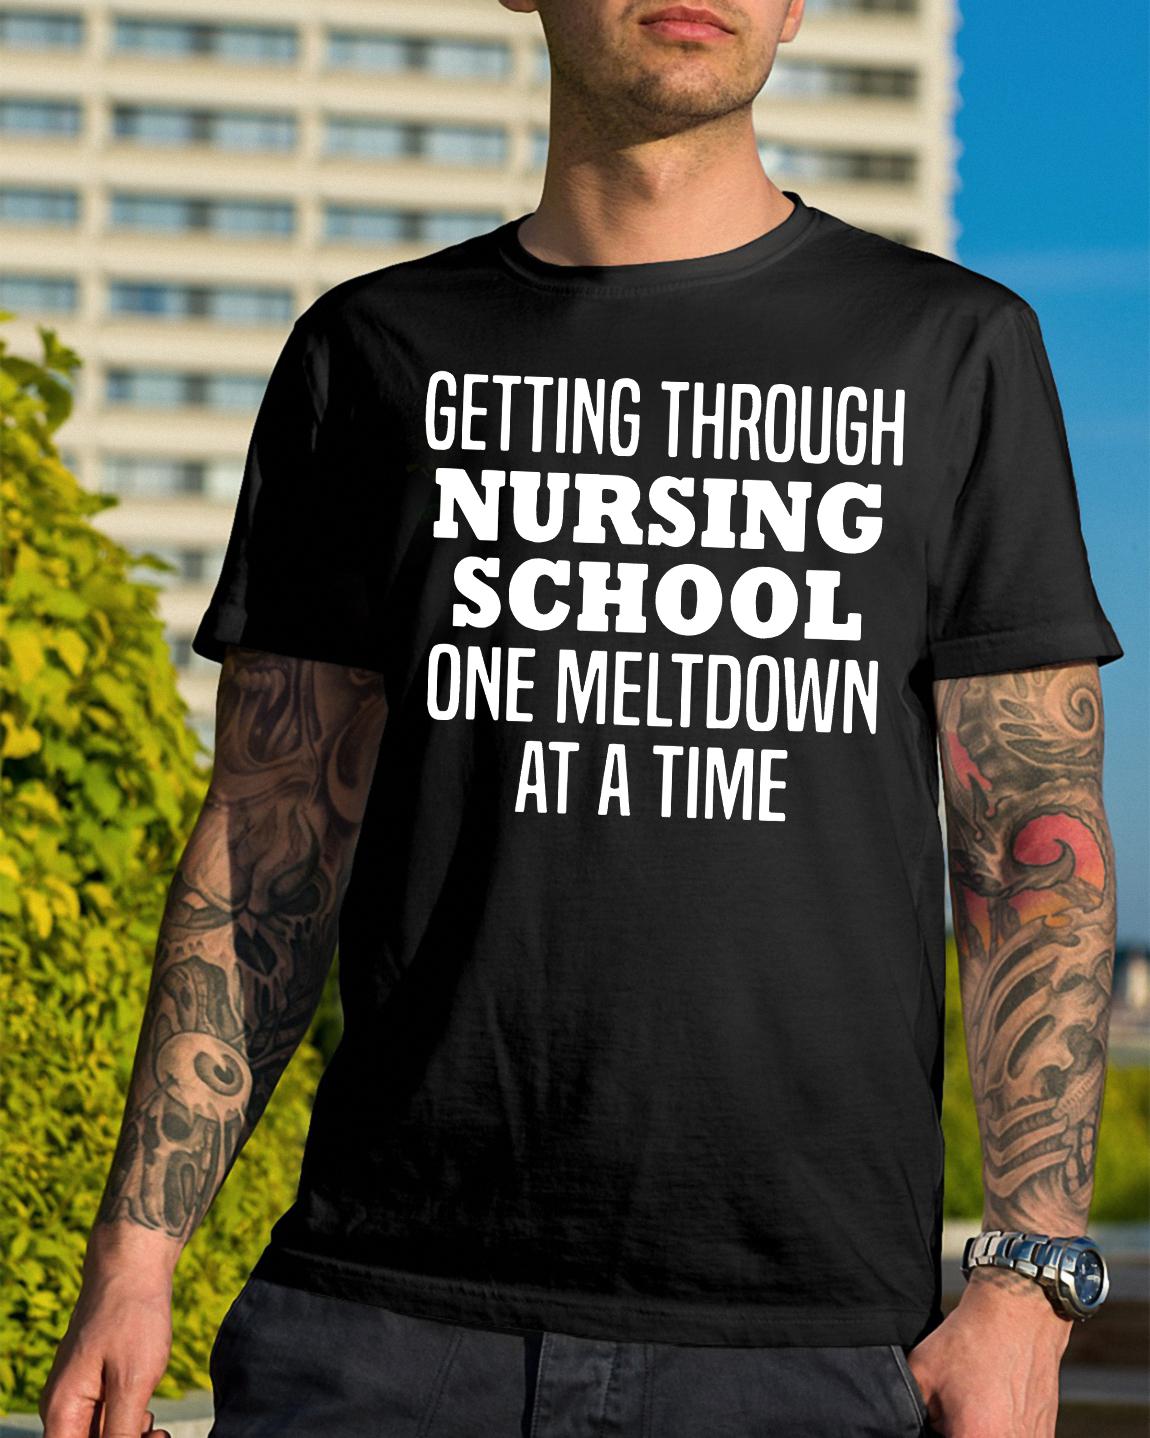 Getting Nursing School One Meltdown Time Shirt